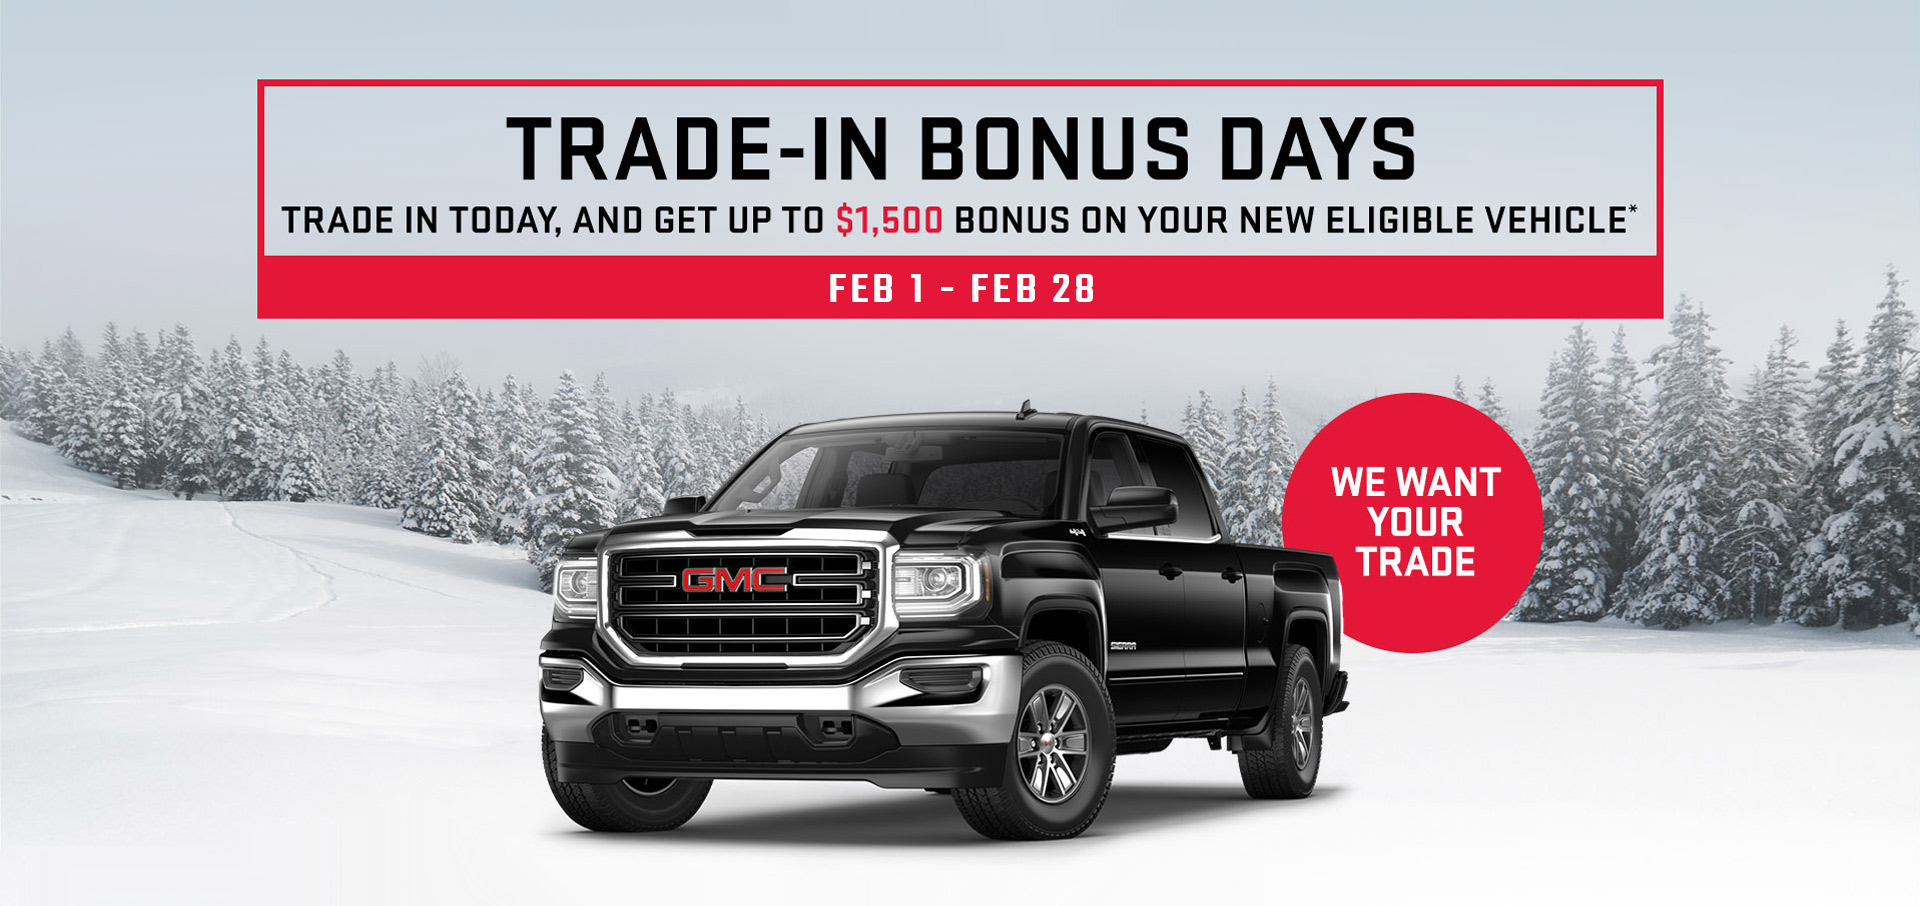 $1500 Trade-In Bonus